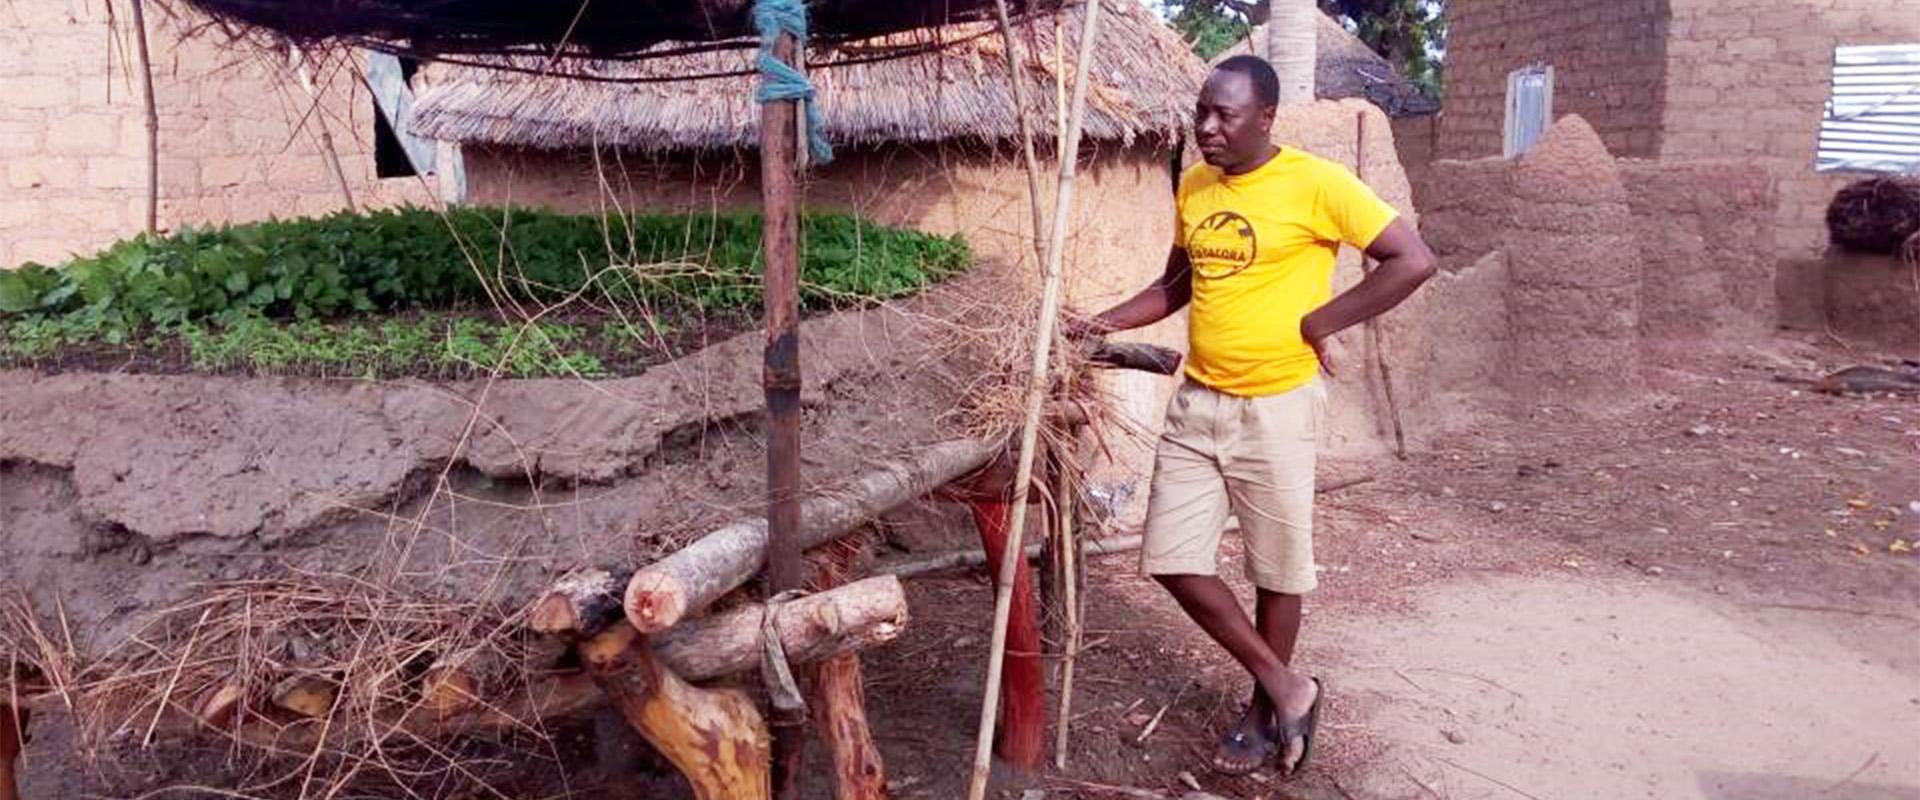 Paul vivaio aereo pomodori Benin Mani Tese 2018